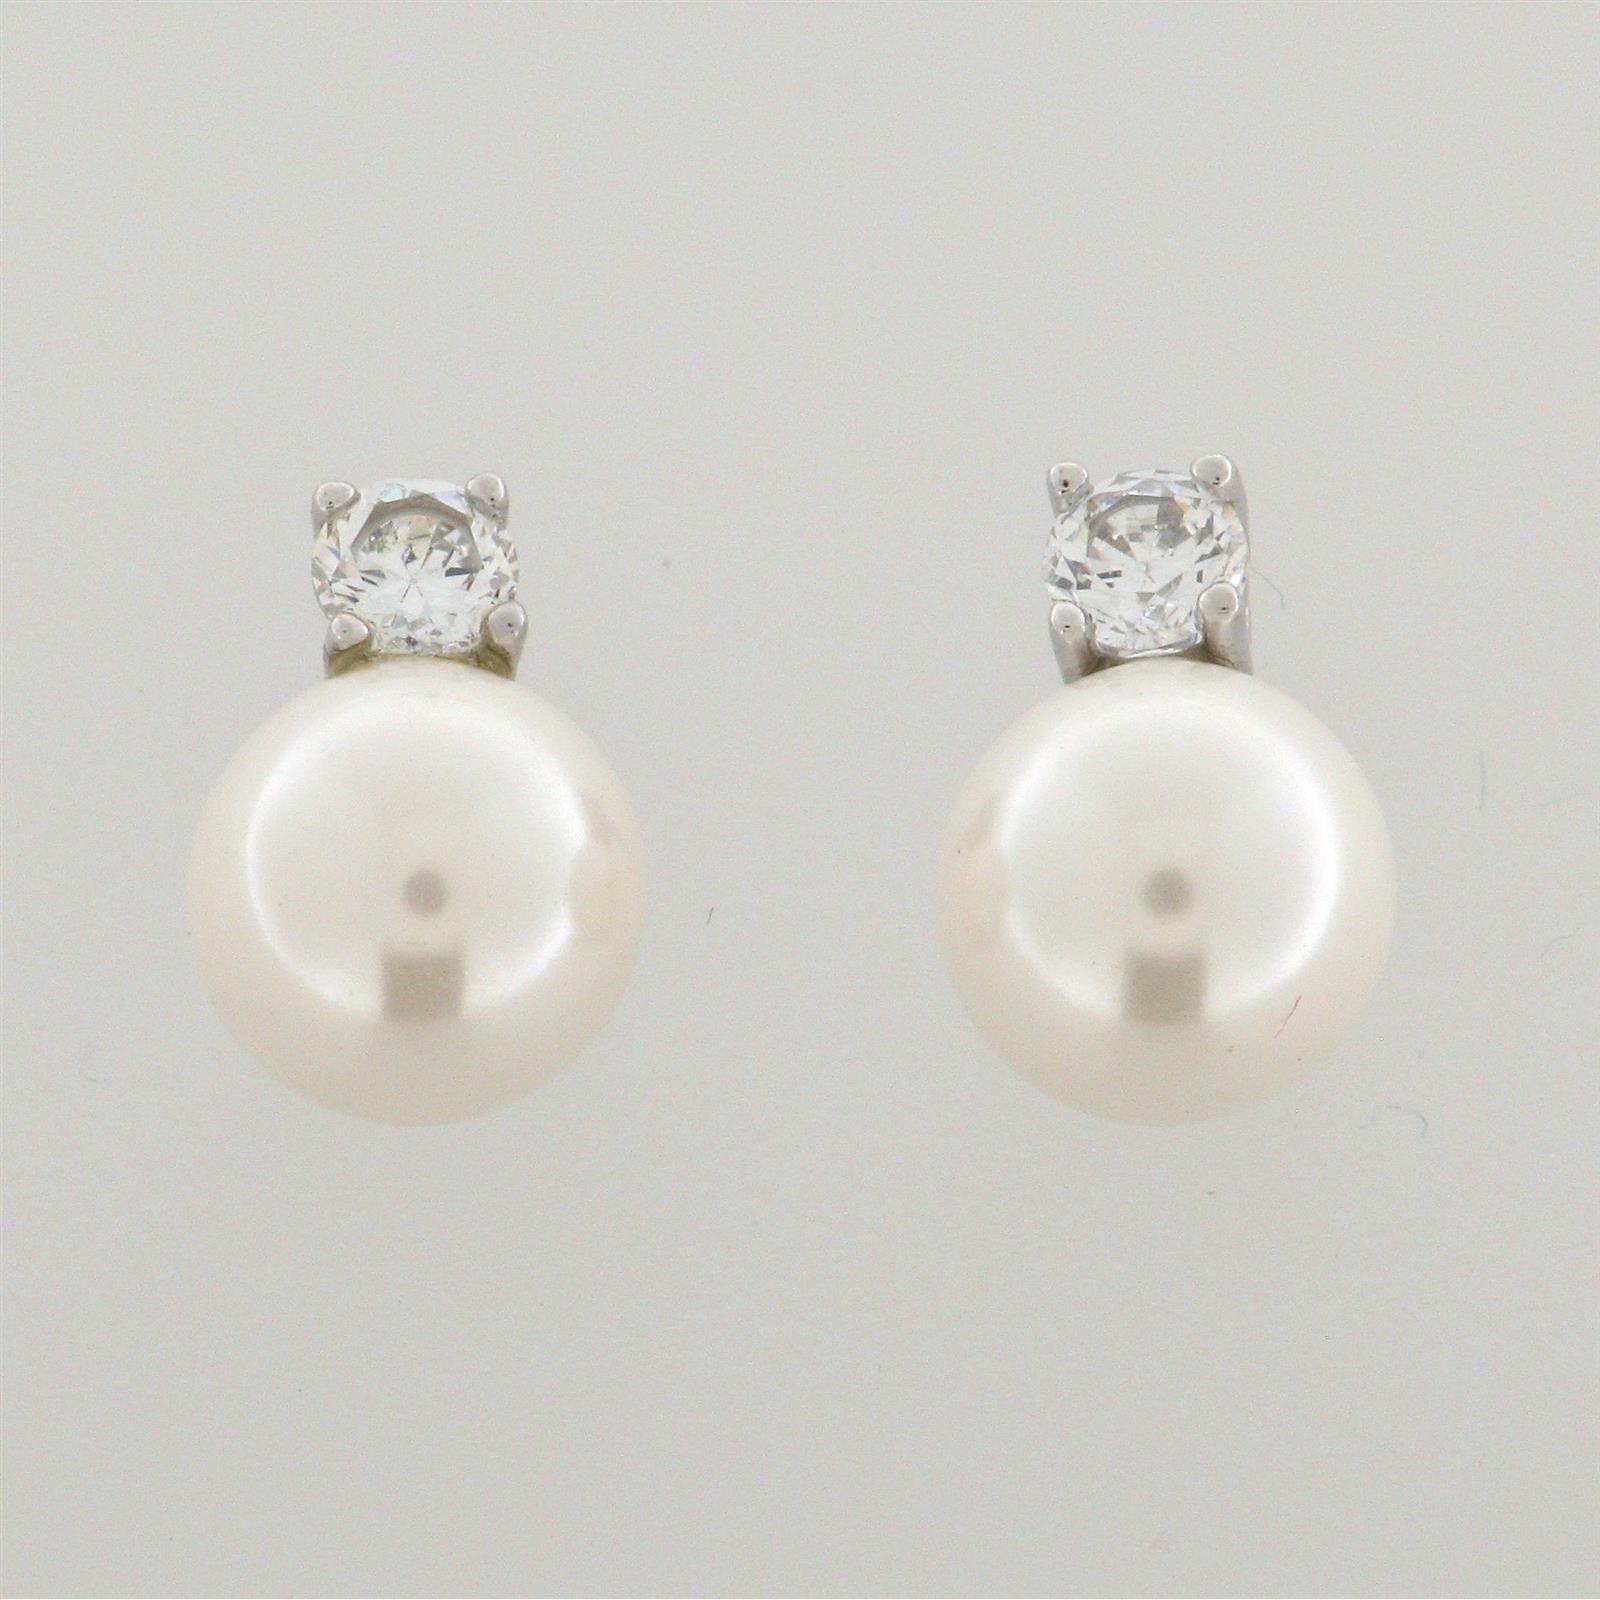 ohrstecker 925 rh perle weiss 8mm zk weiss 14 00. Black Bedroom Furniture Sets. Home Design Ideas